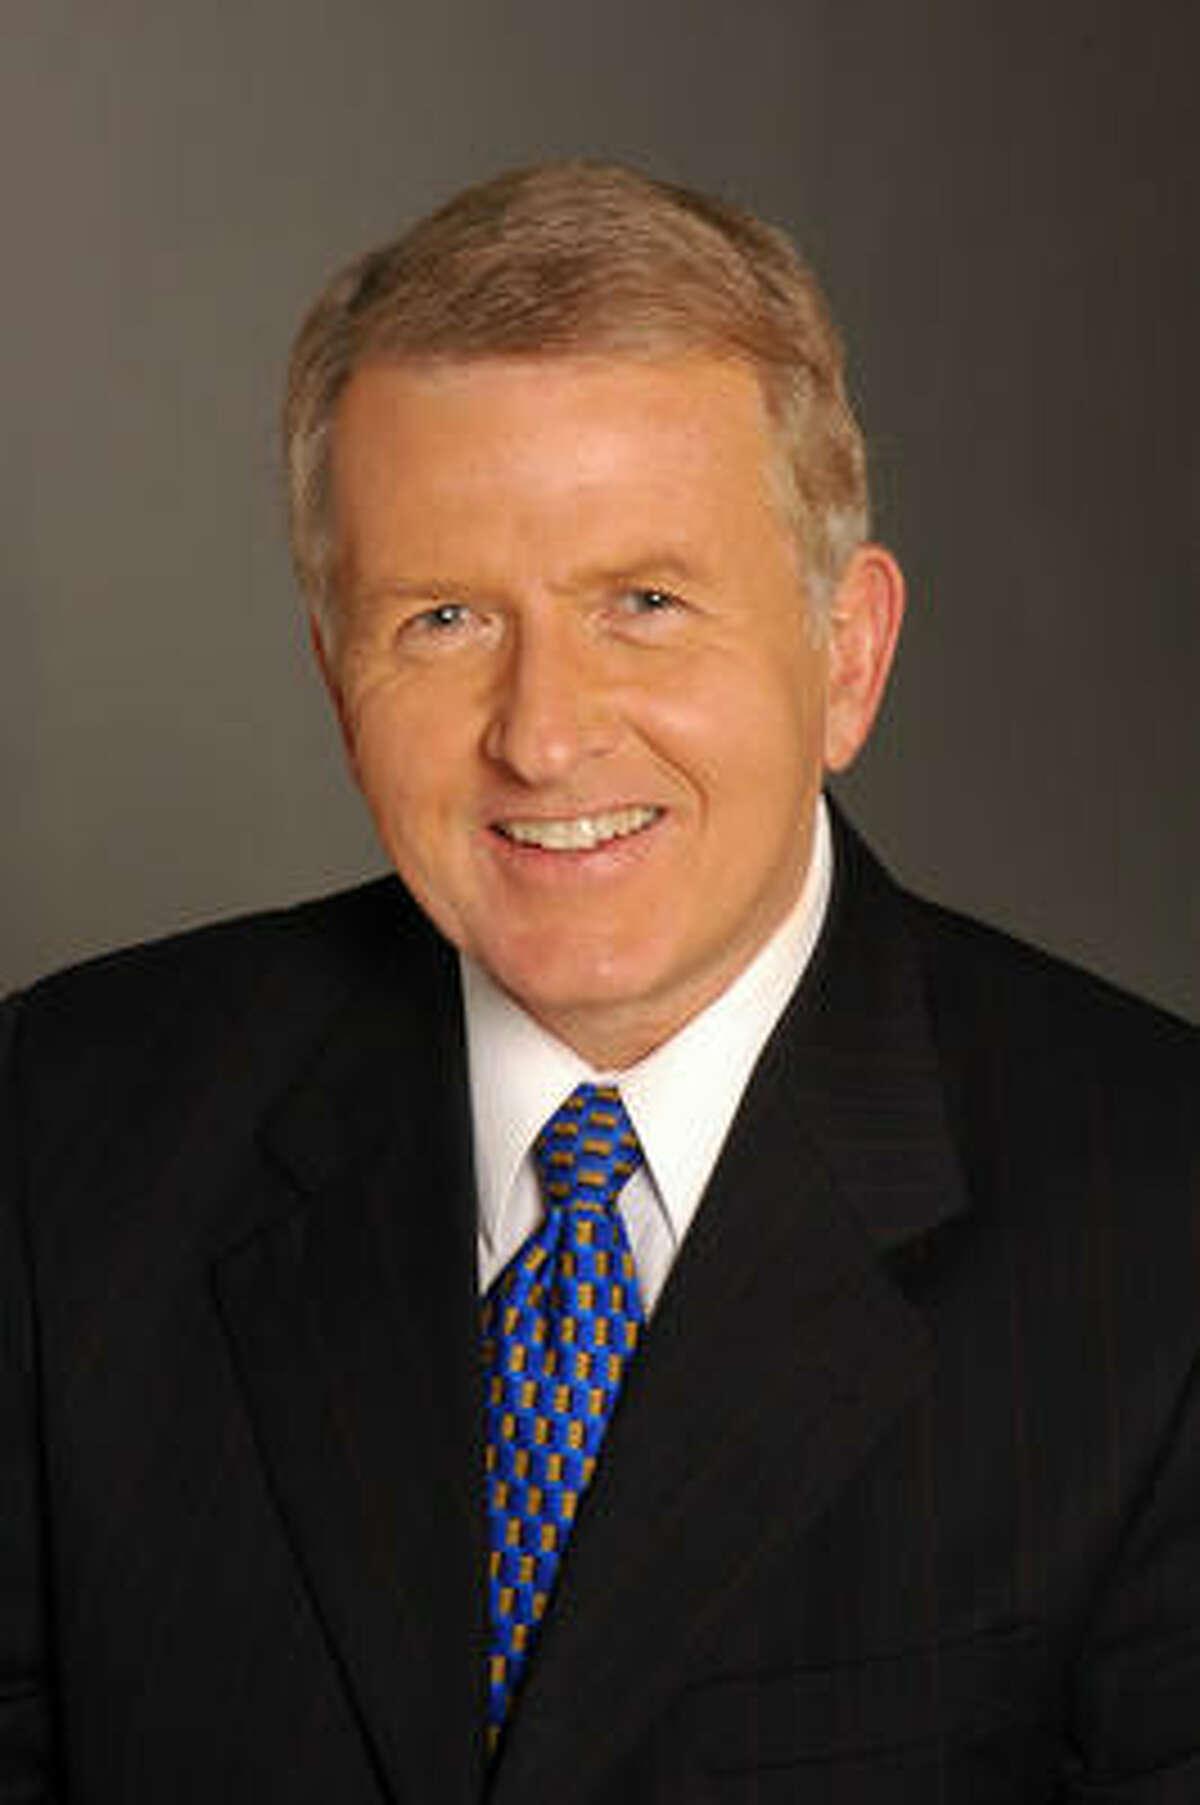 Greg Lucas, TV broadcaster